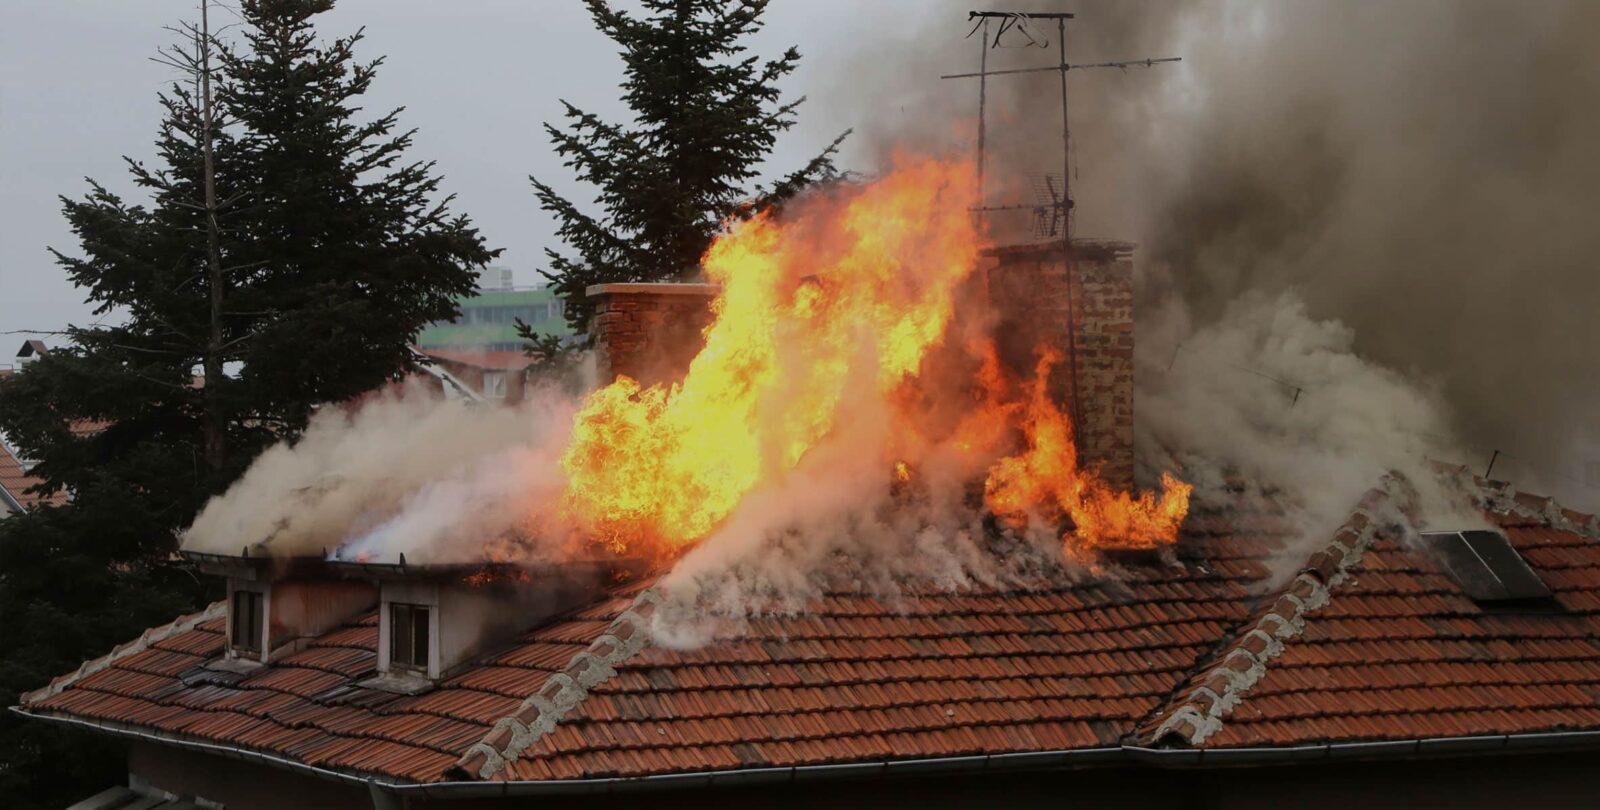 fire damage adjuster miami